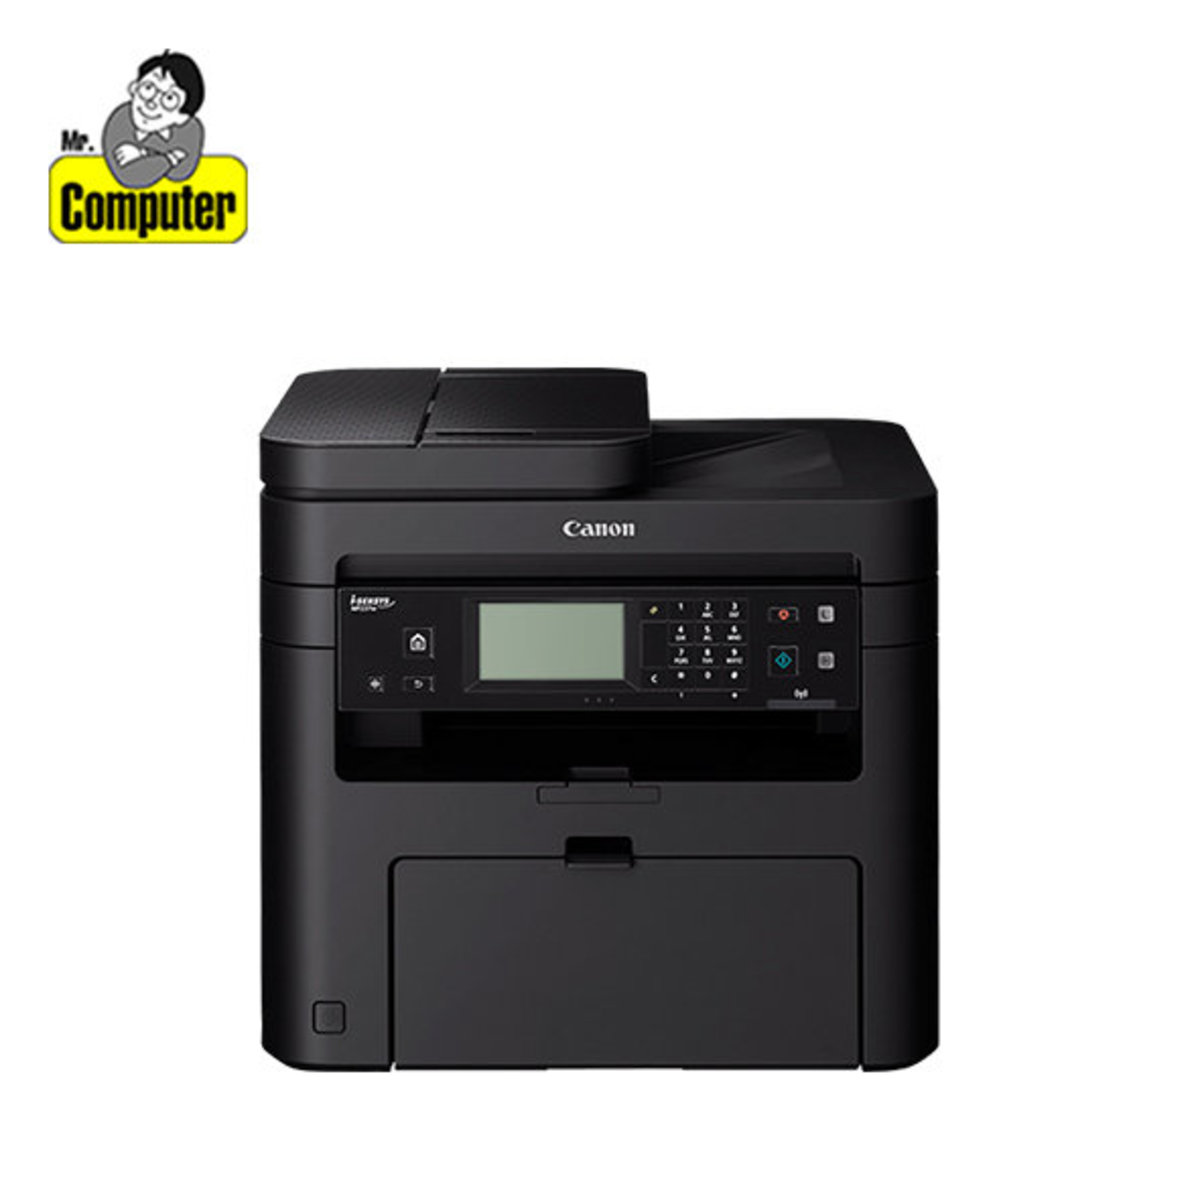 MF237w 四合一黑白雷射打印機